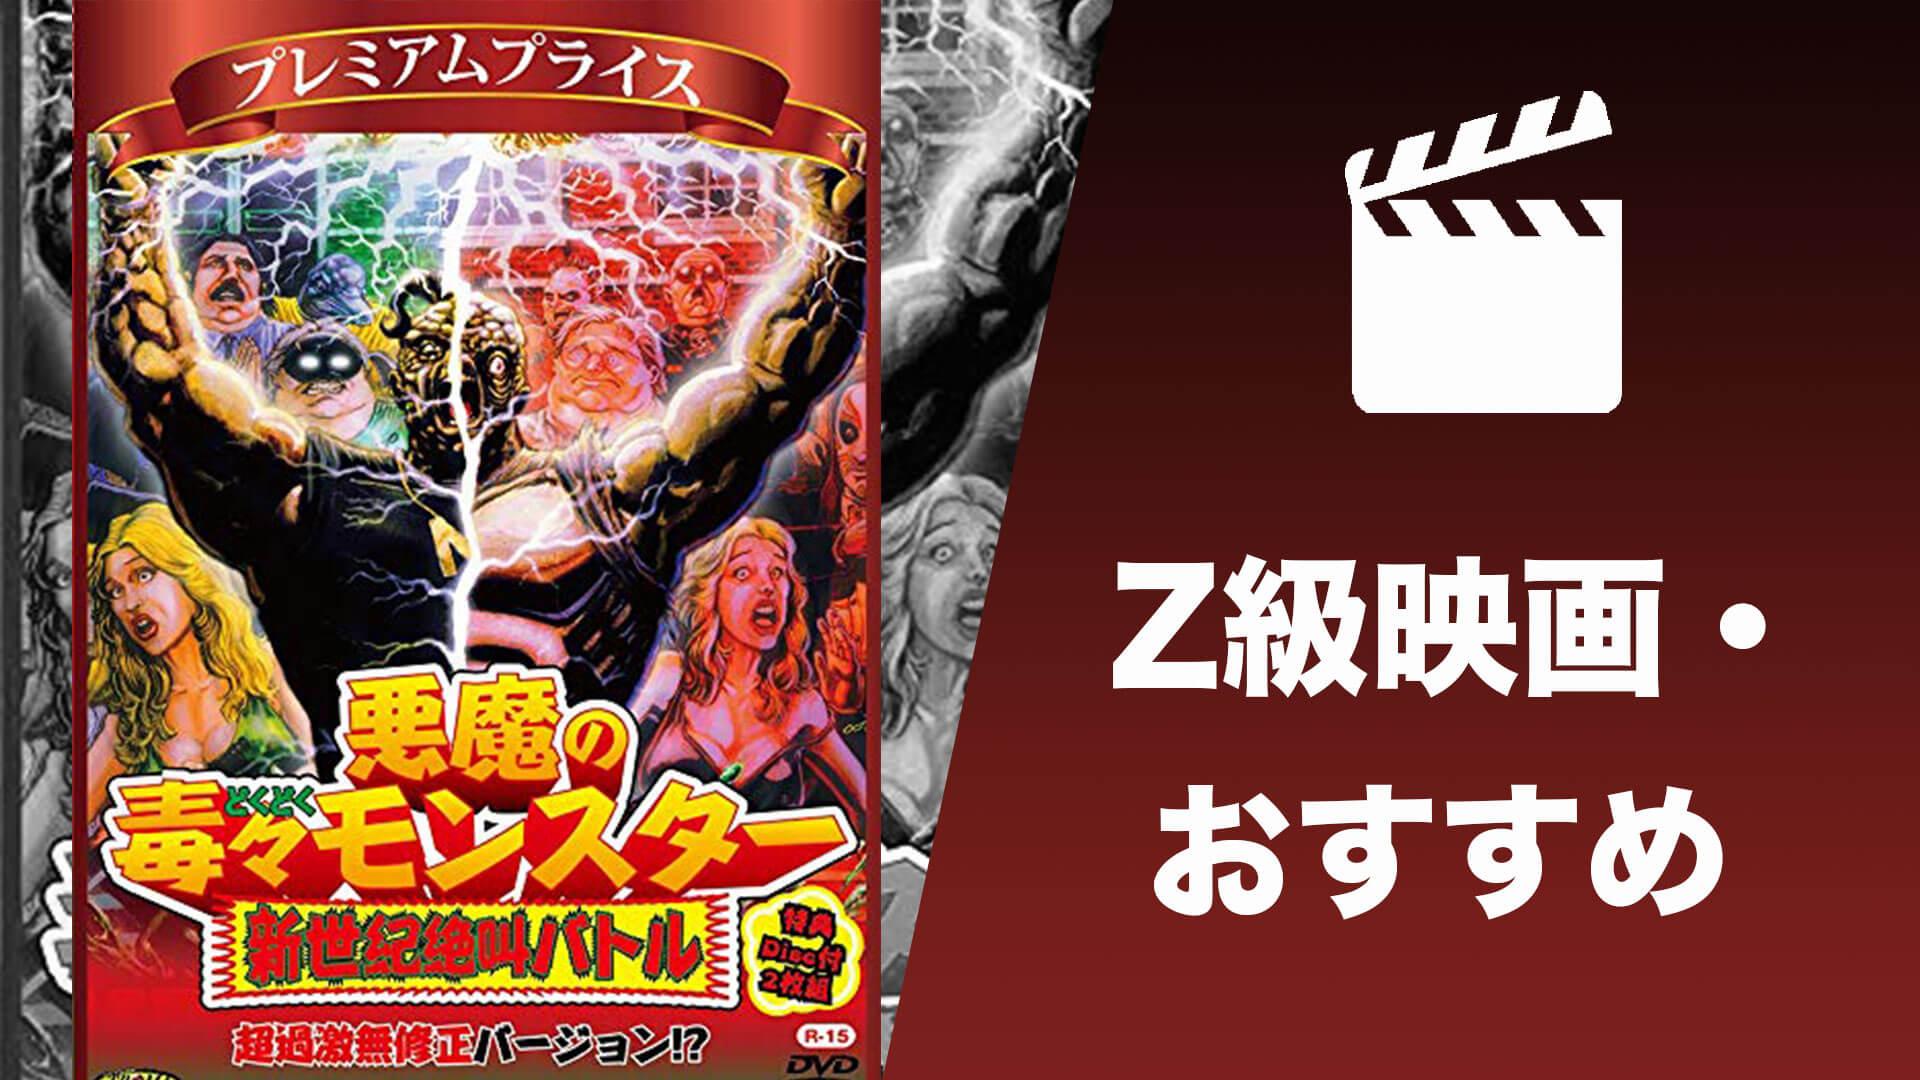 Z級映画おすすめランキング10選【まだあなたが知らないZ級の世界】